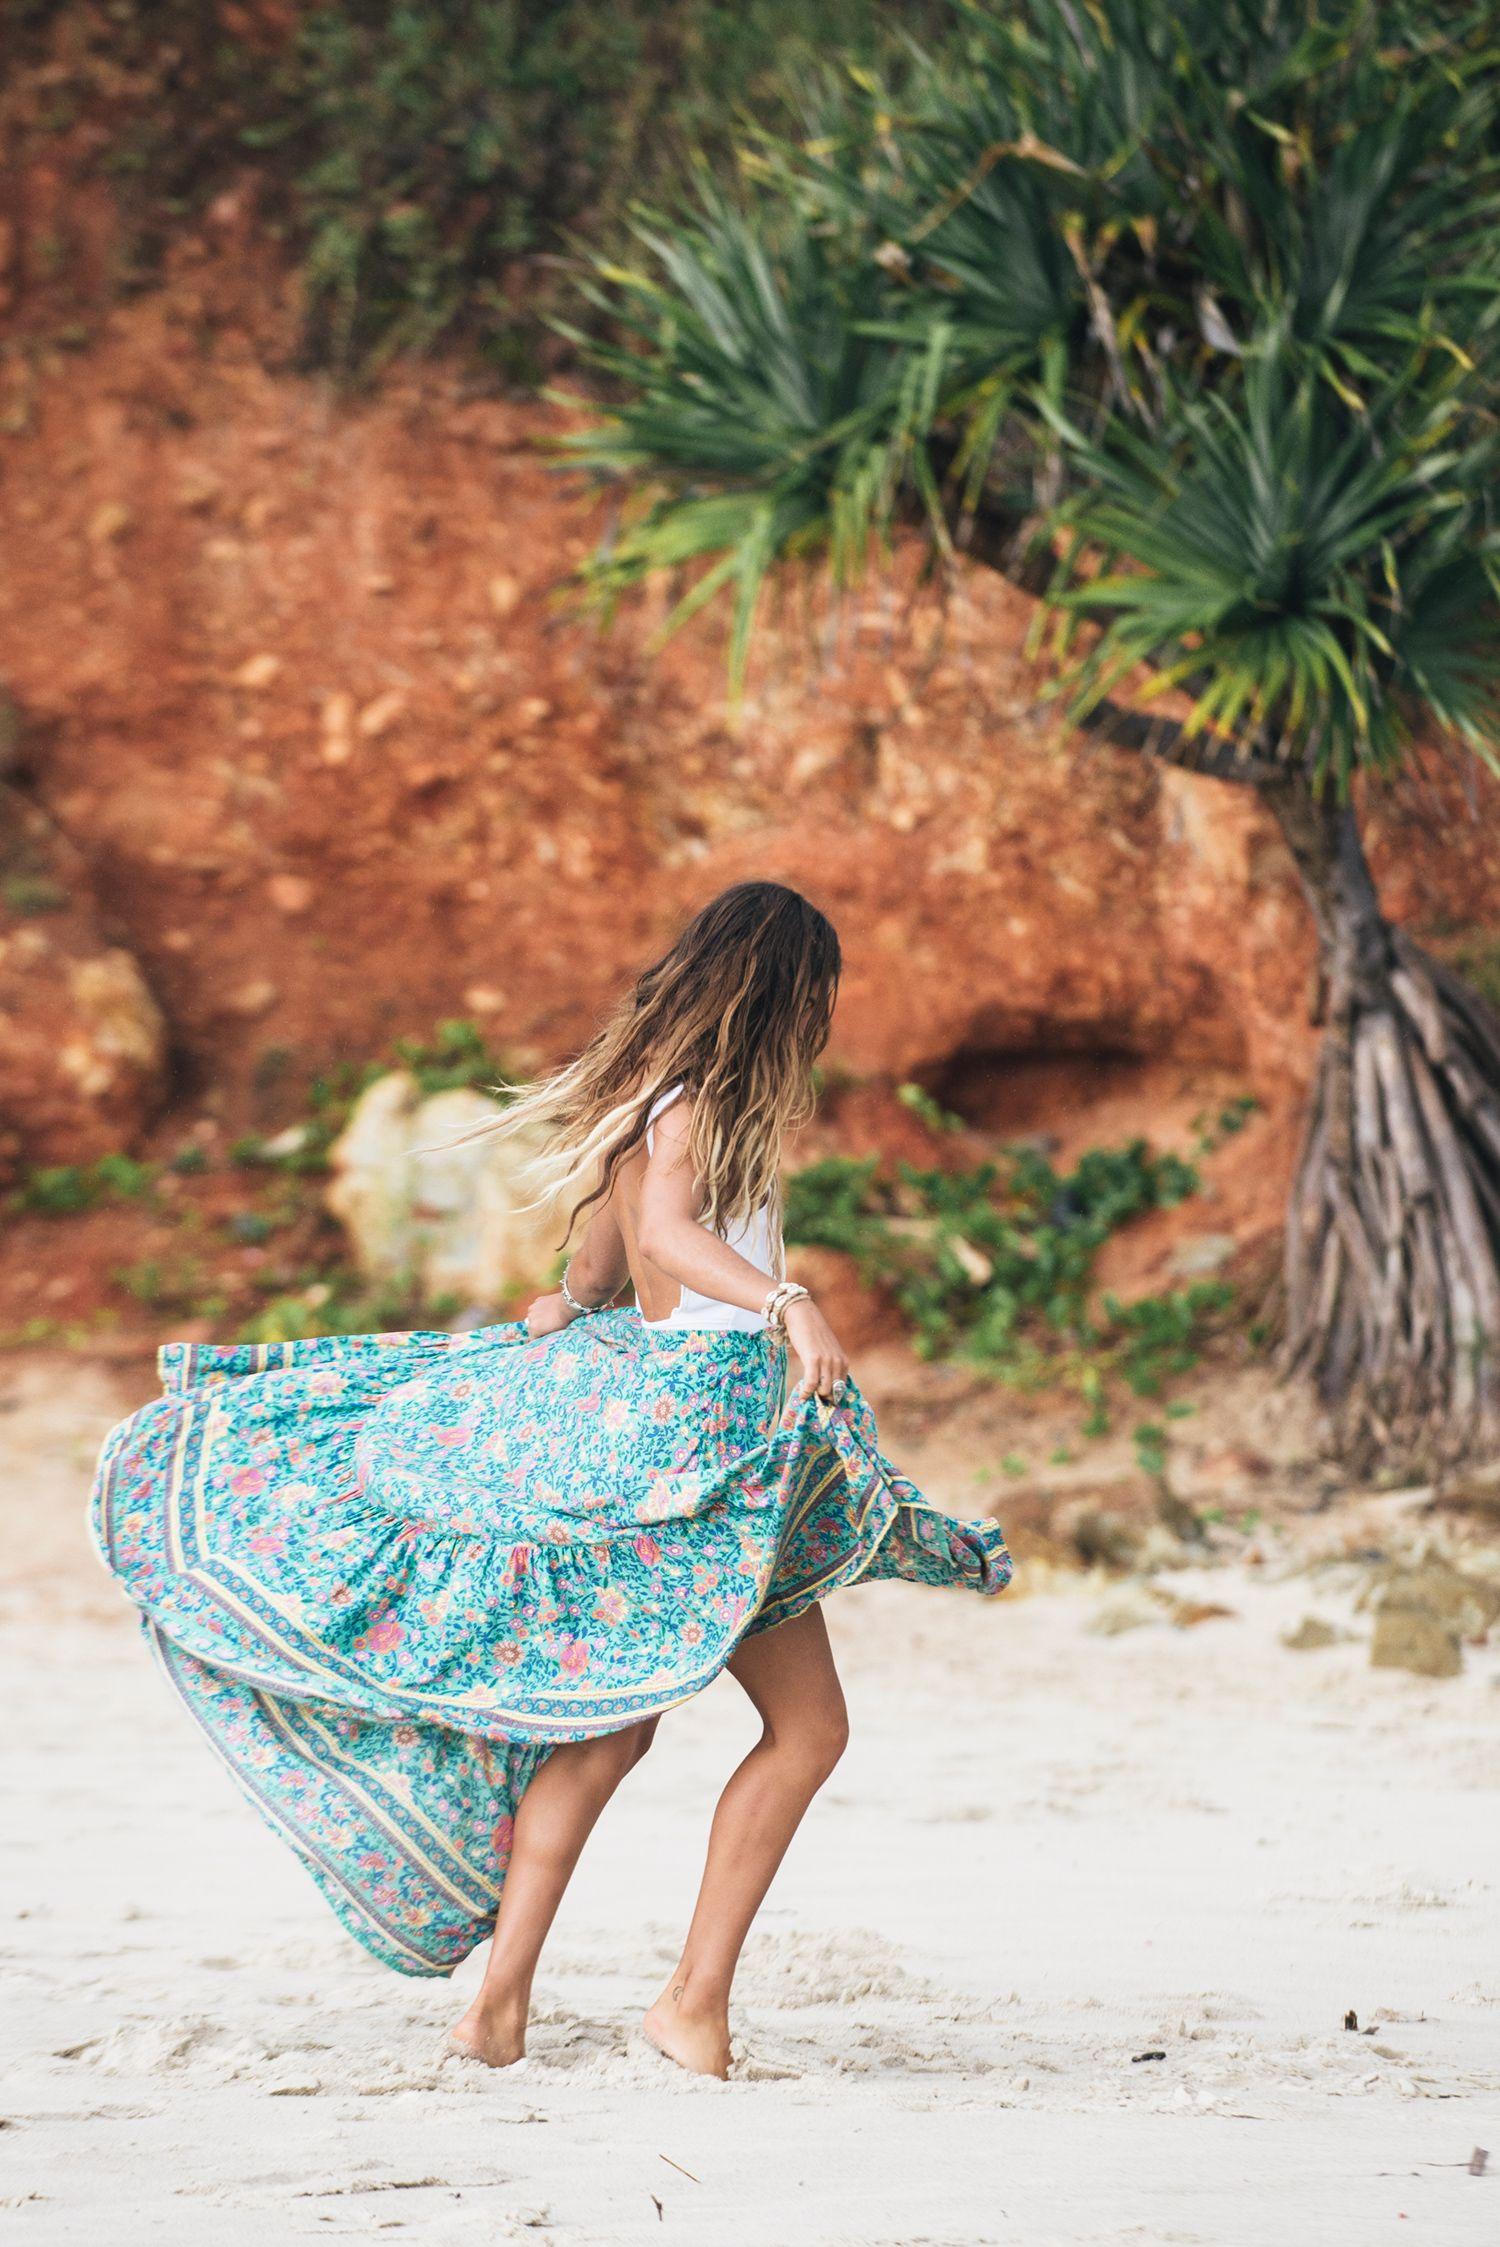 2019 Mimi Elashiry nudes (44 photos), Ass, Hot, Instagram, cleavage 2020